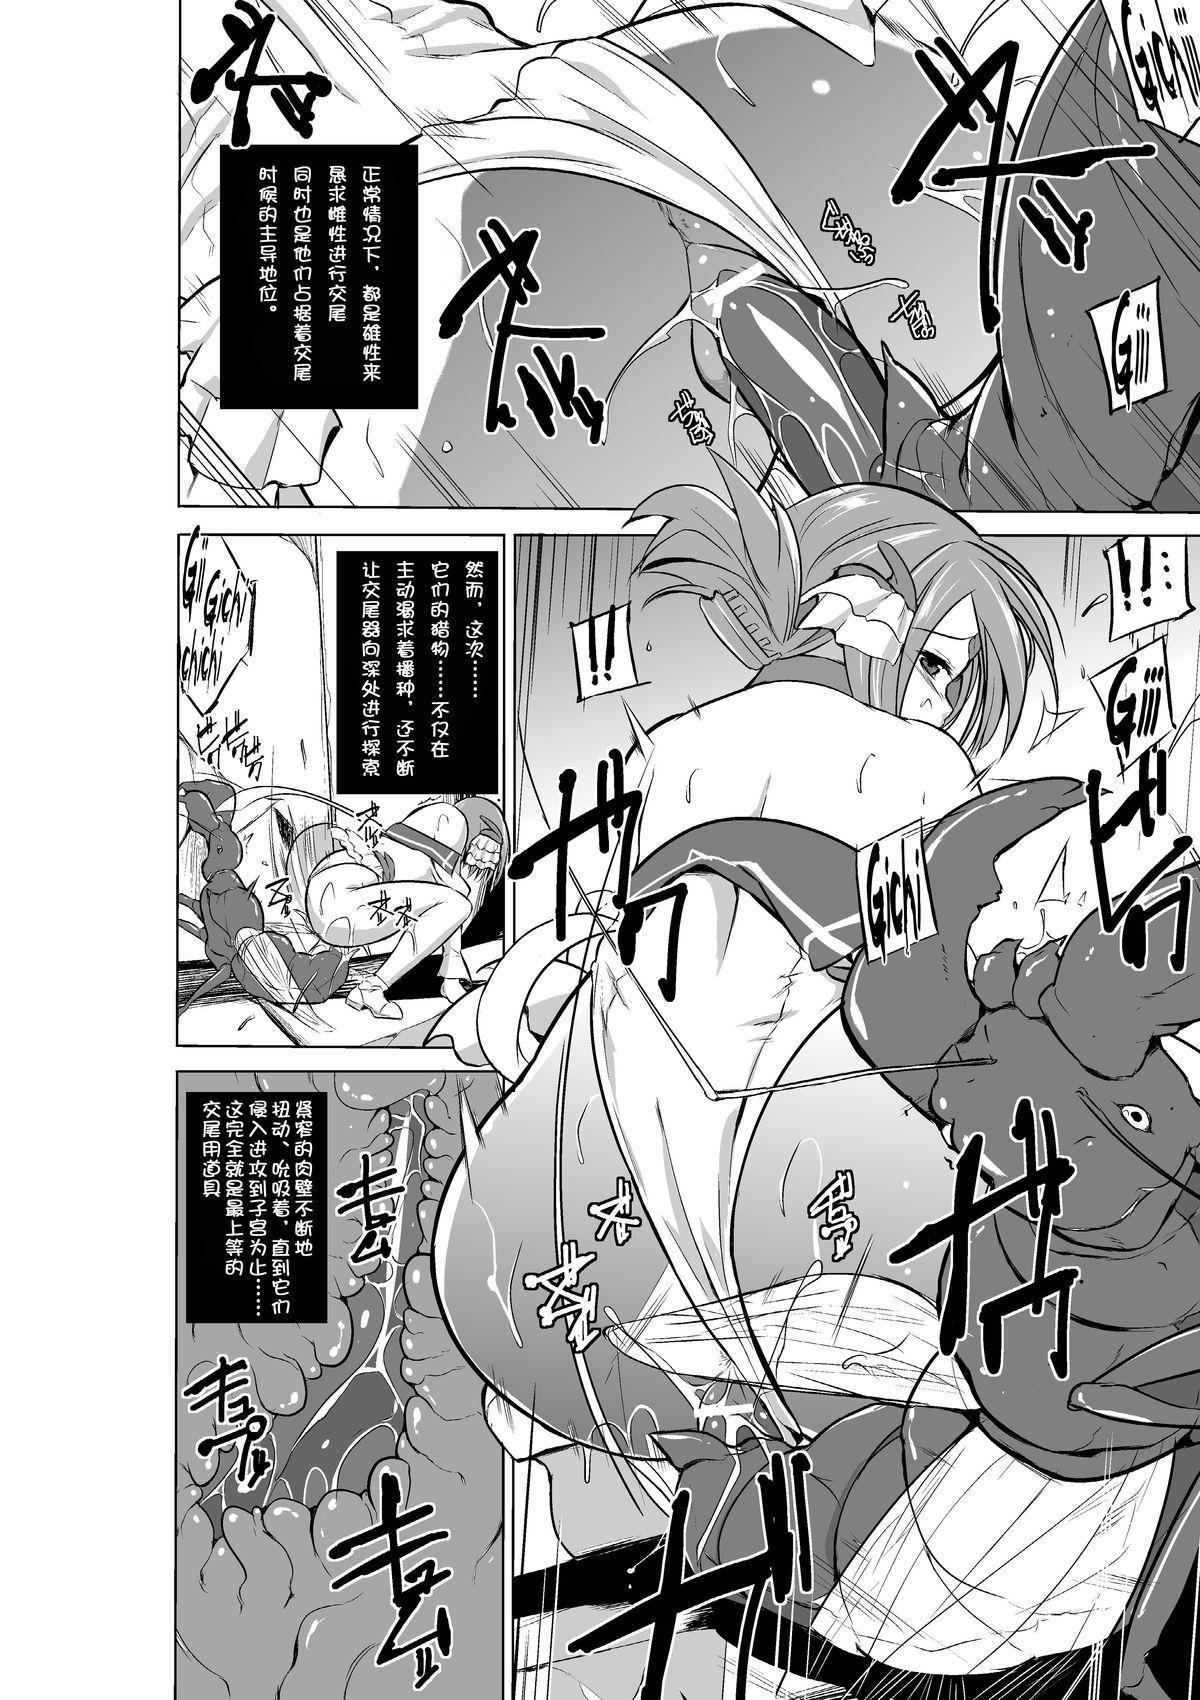 Dungeon Travelers - Manaka no Himegoto 2 7